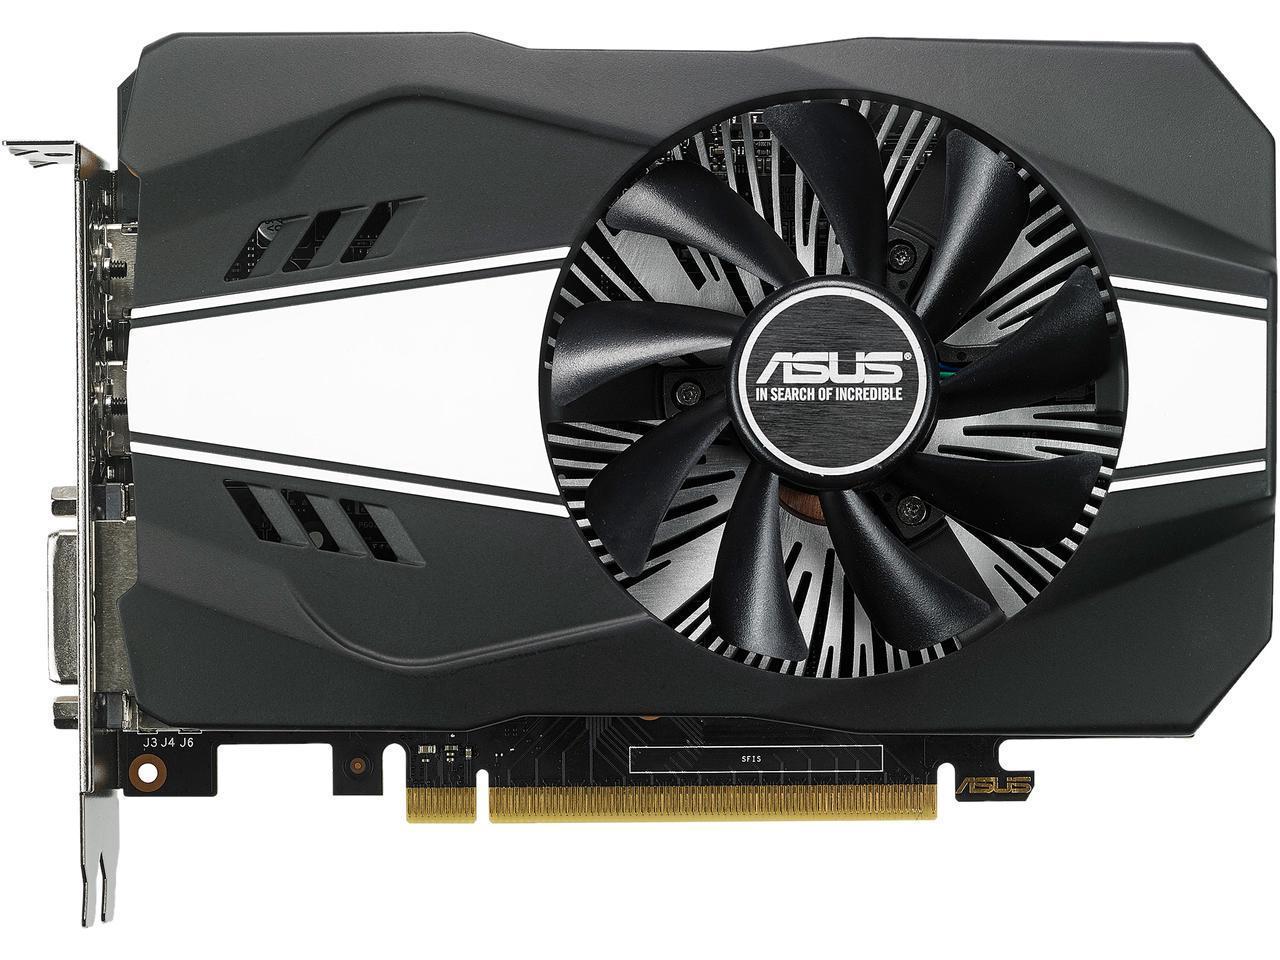 ASUS GeForce GTX 1060 PH-GTX1060-6G 6GB 192-Bit GDDR5 PCI Express 3.0 HDCP Ready Video Card + Fortnite Bundle + FS $209.99